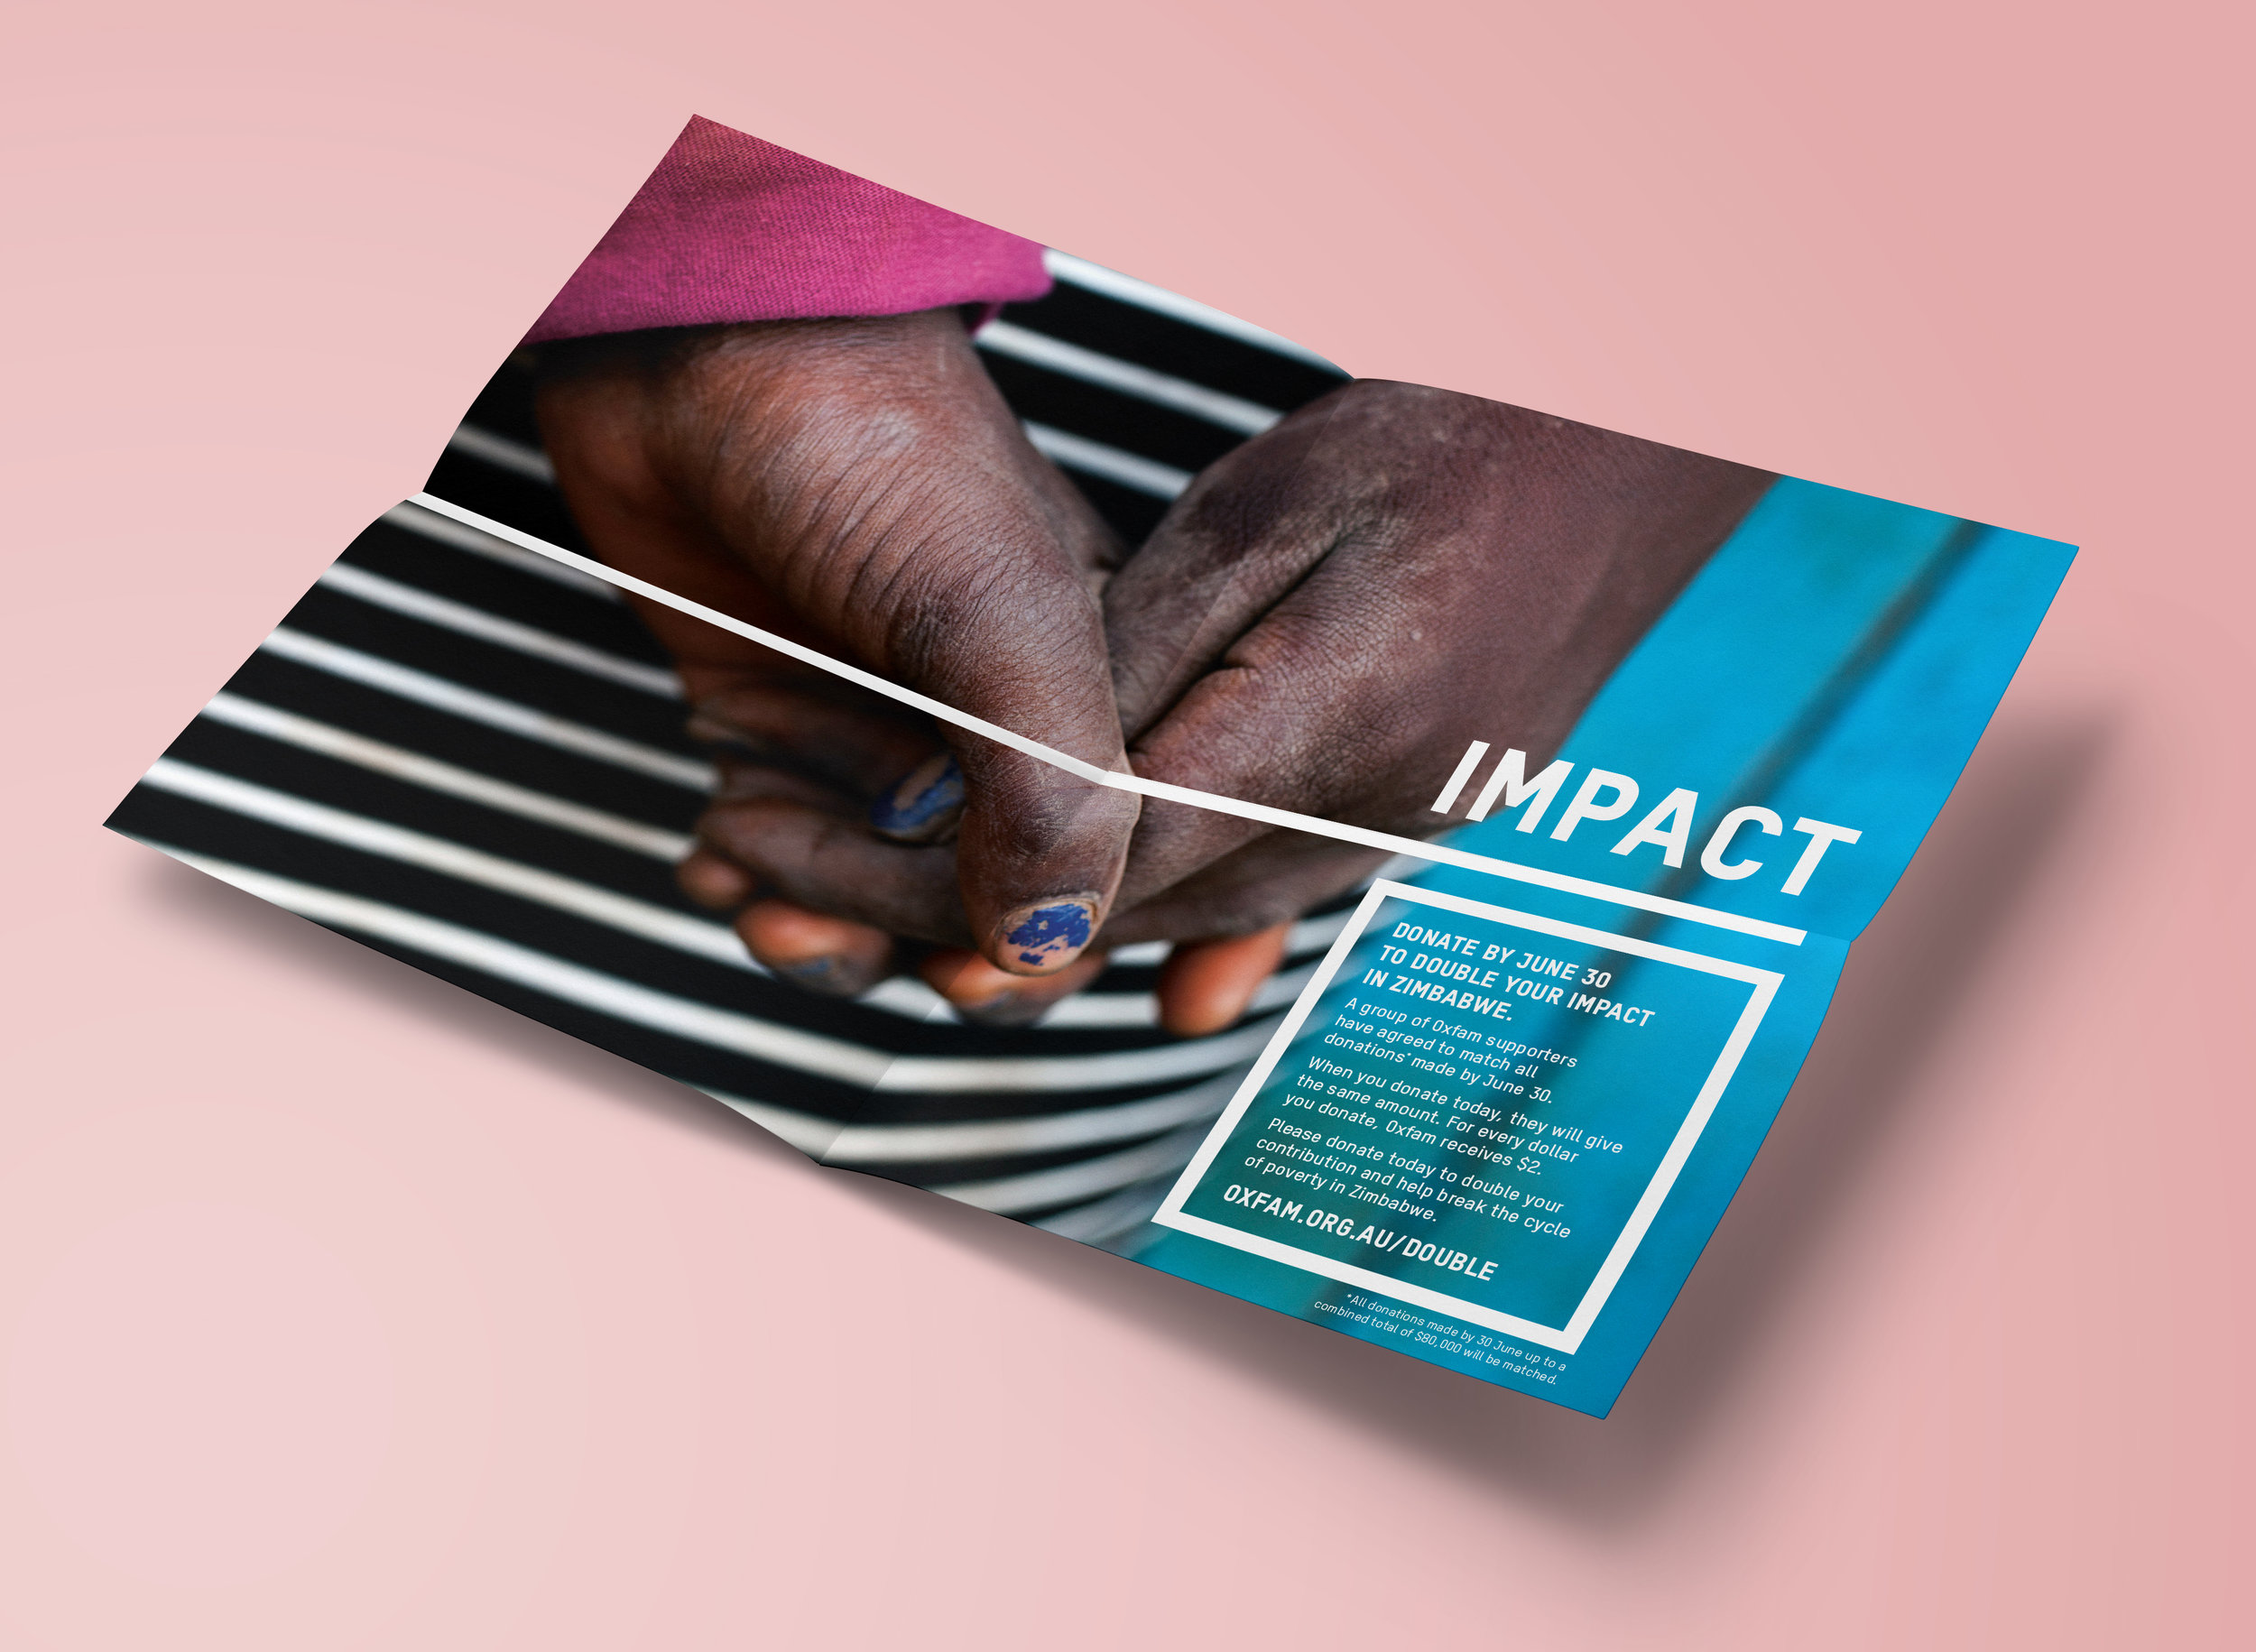 double your impact 2.jpg